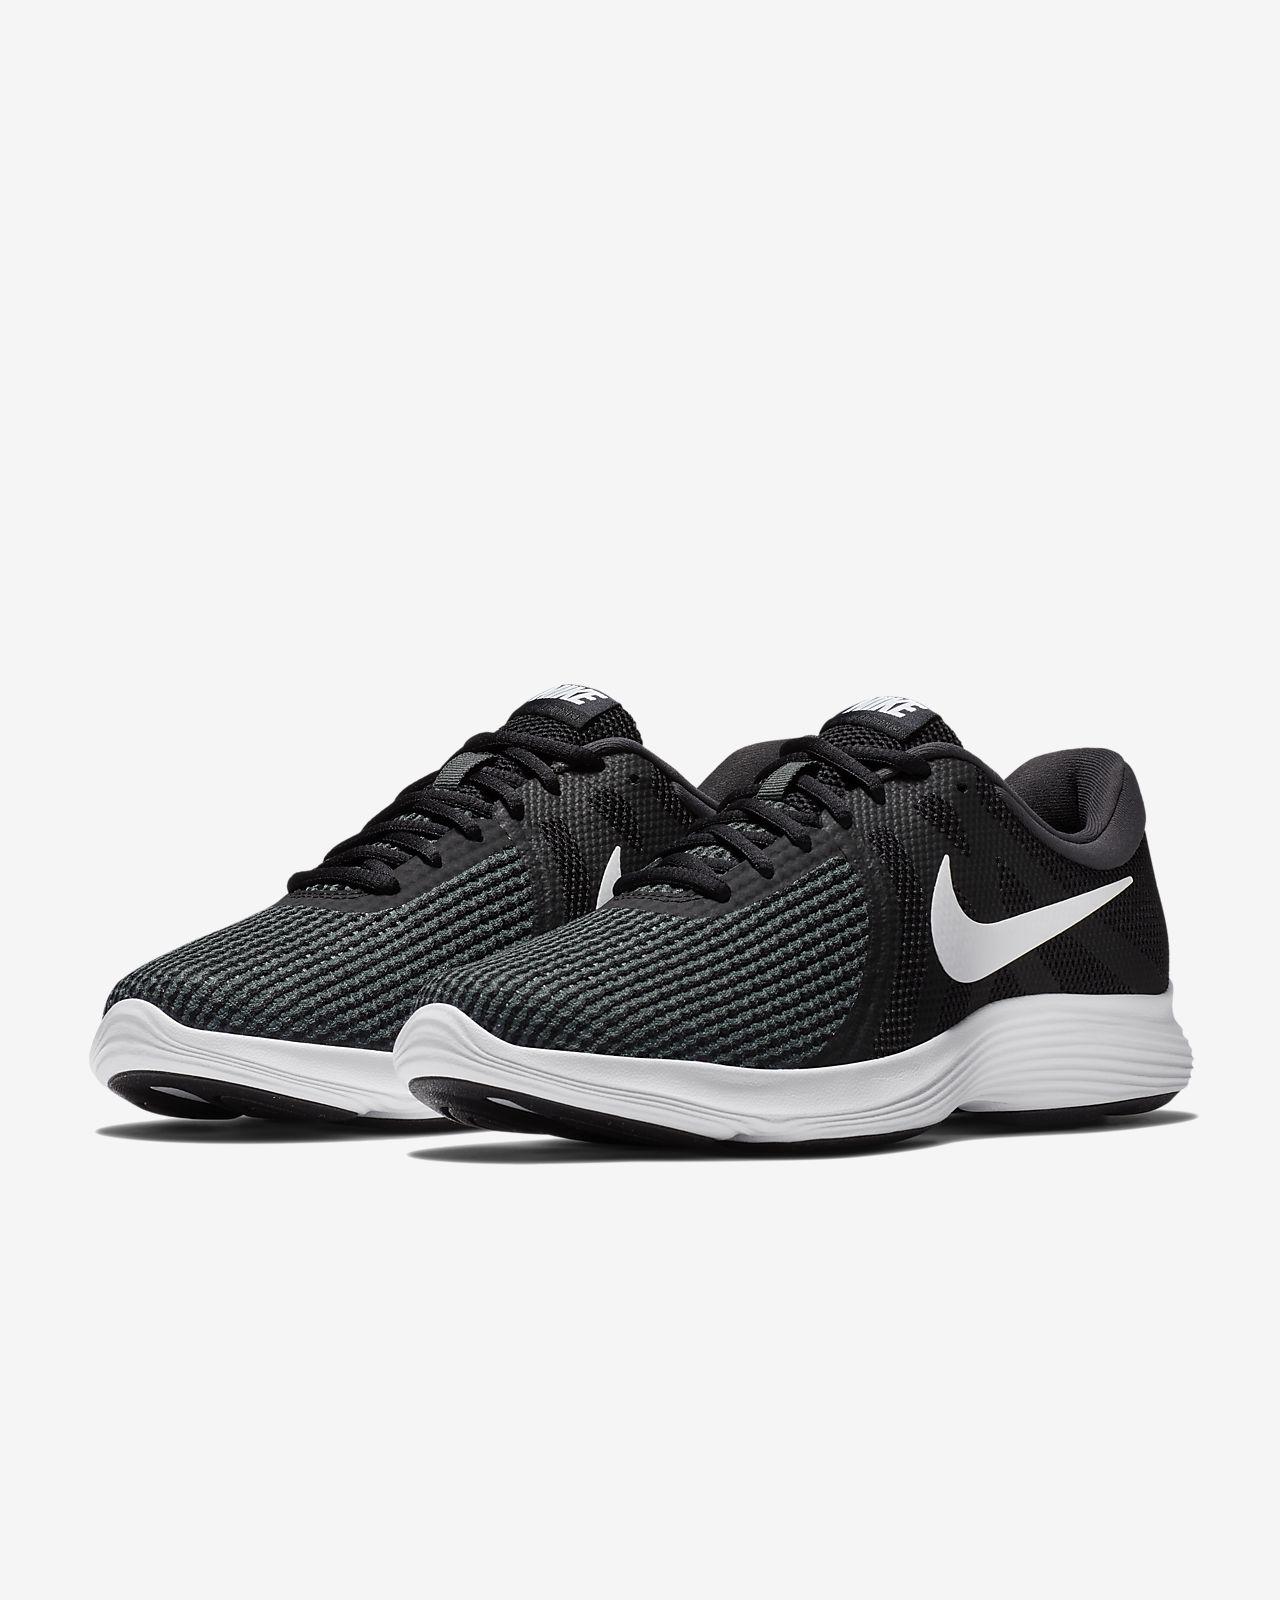 1710b4fb20 Men's Nike Revolution 4 Running Shoe (EU). Nike.com GB